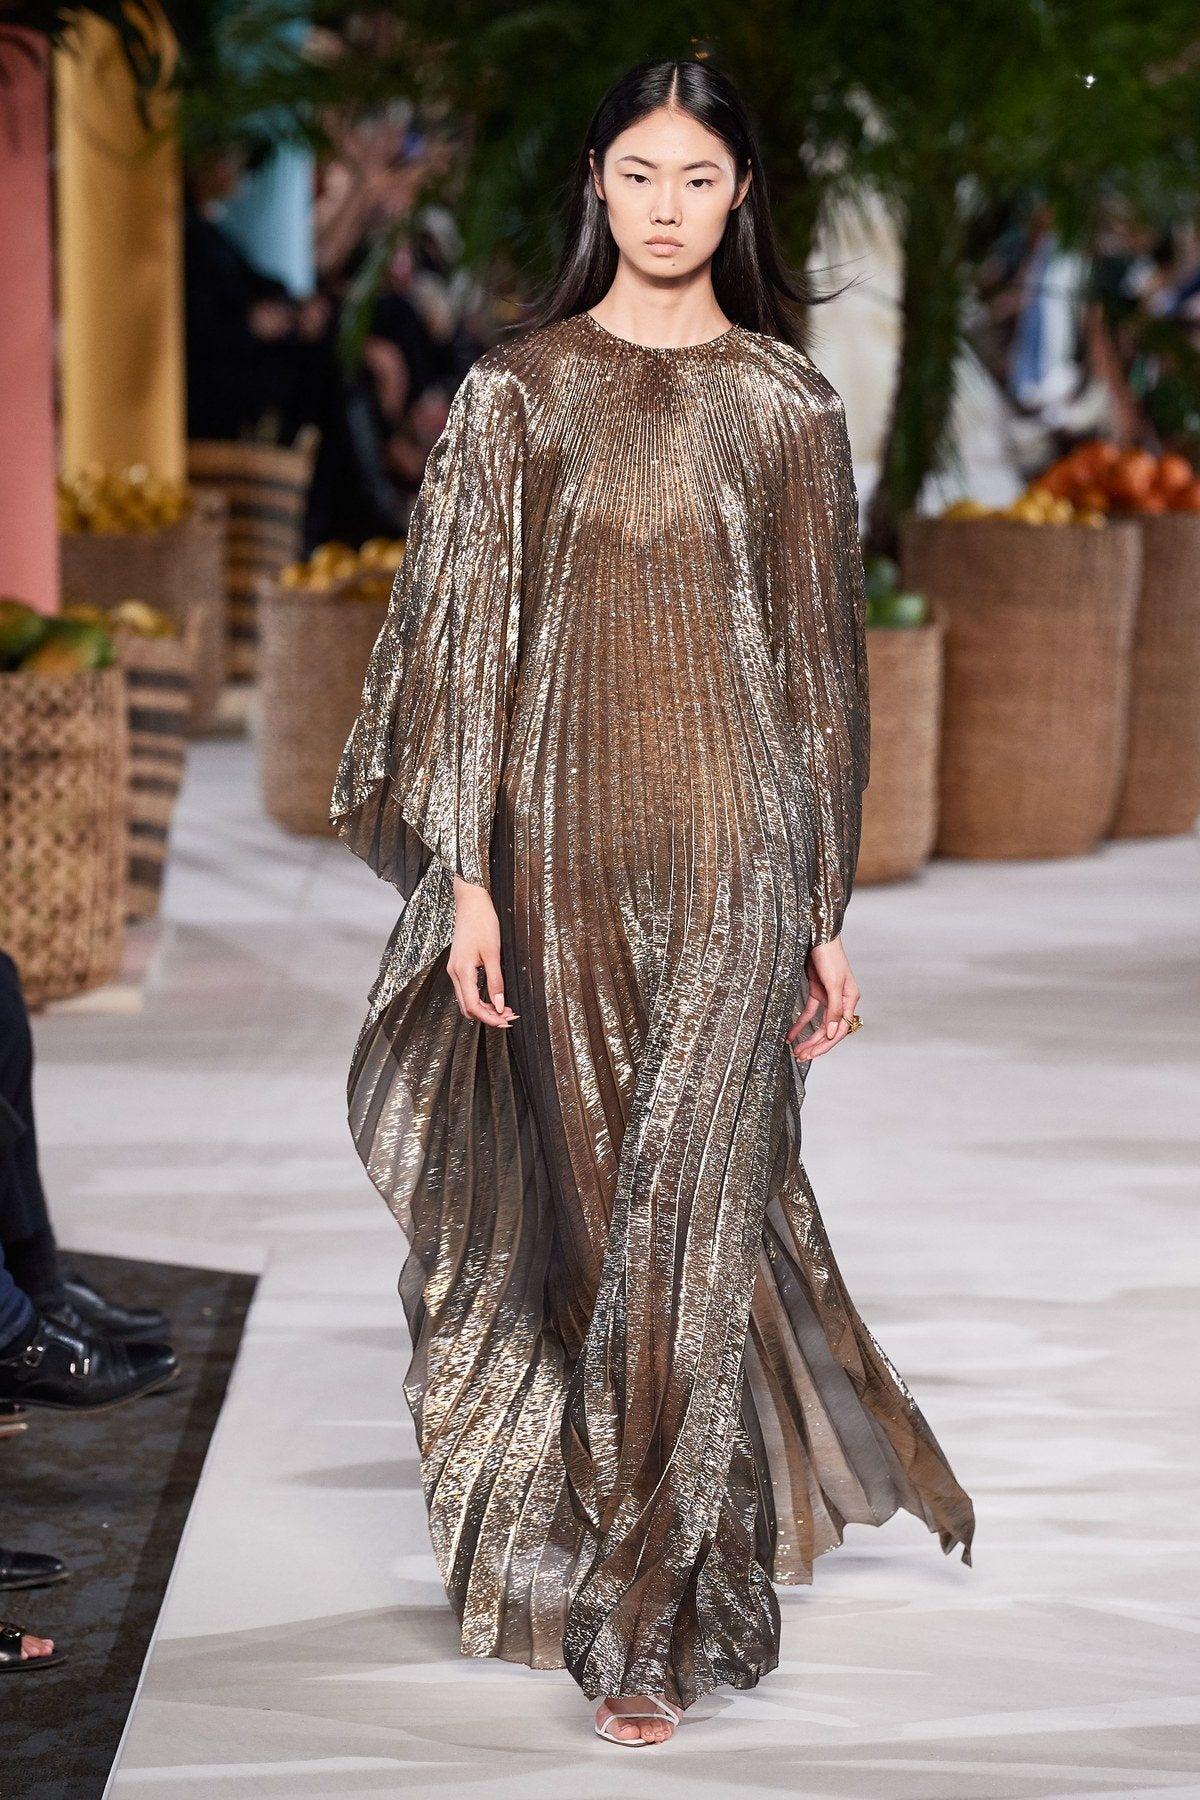 Photo of Oscar de la Renta Mote Show klær for klær våren 2020